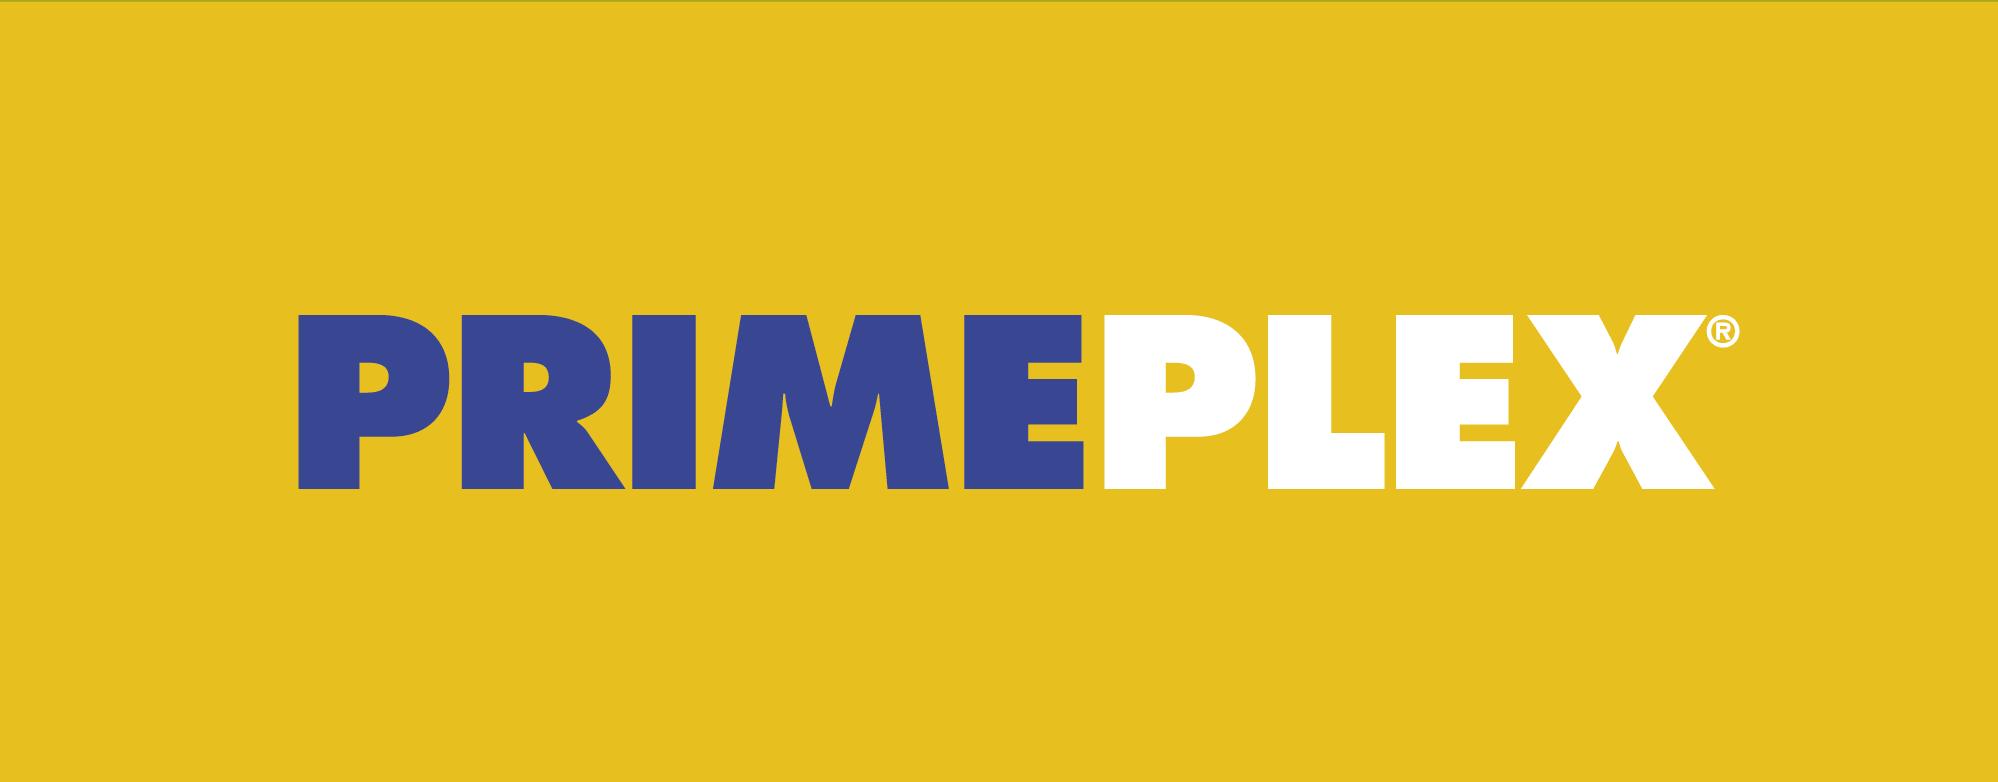 logo-primeplex-huistopper-witzand-bouwmaterialen